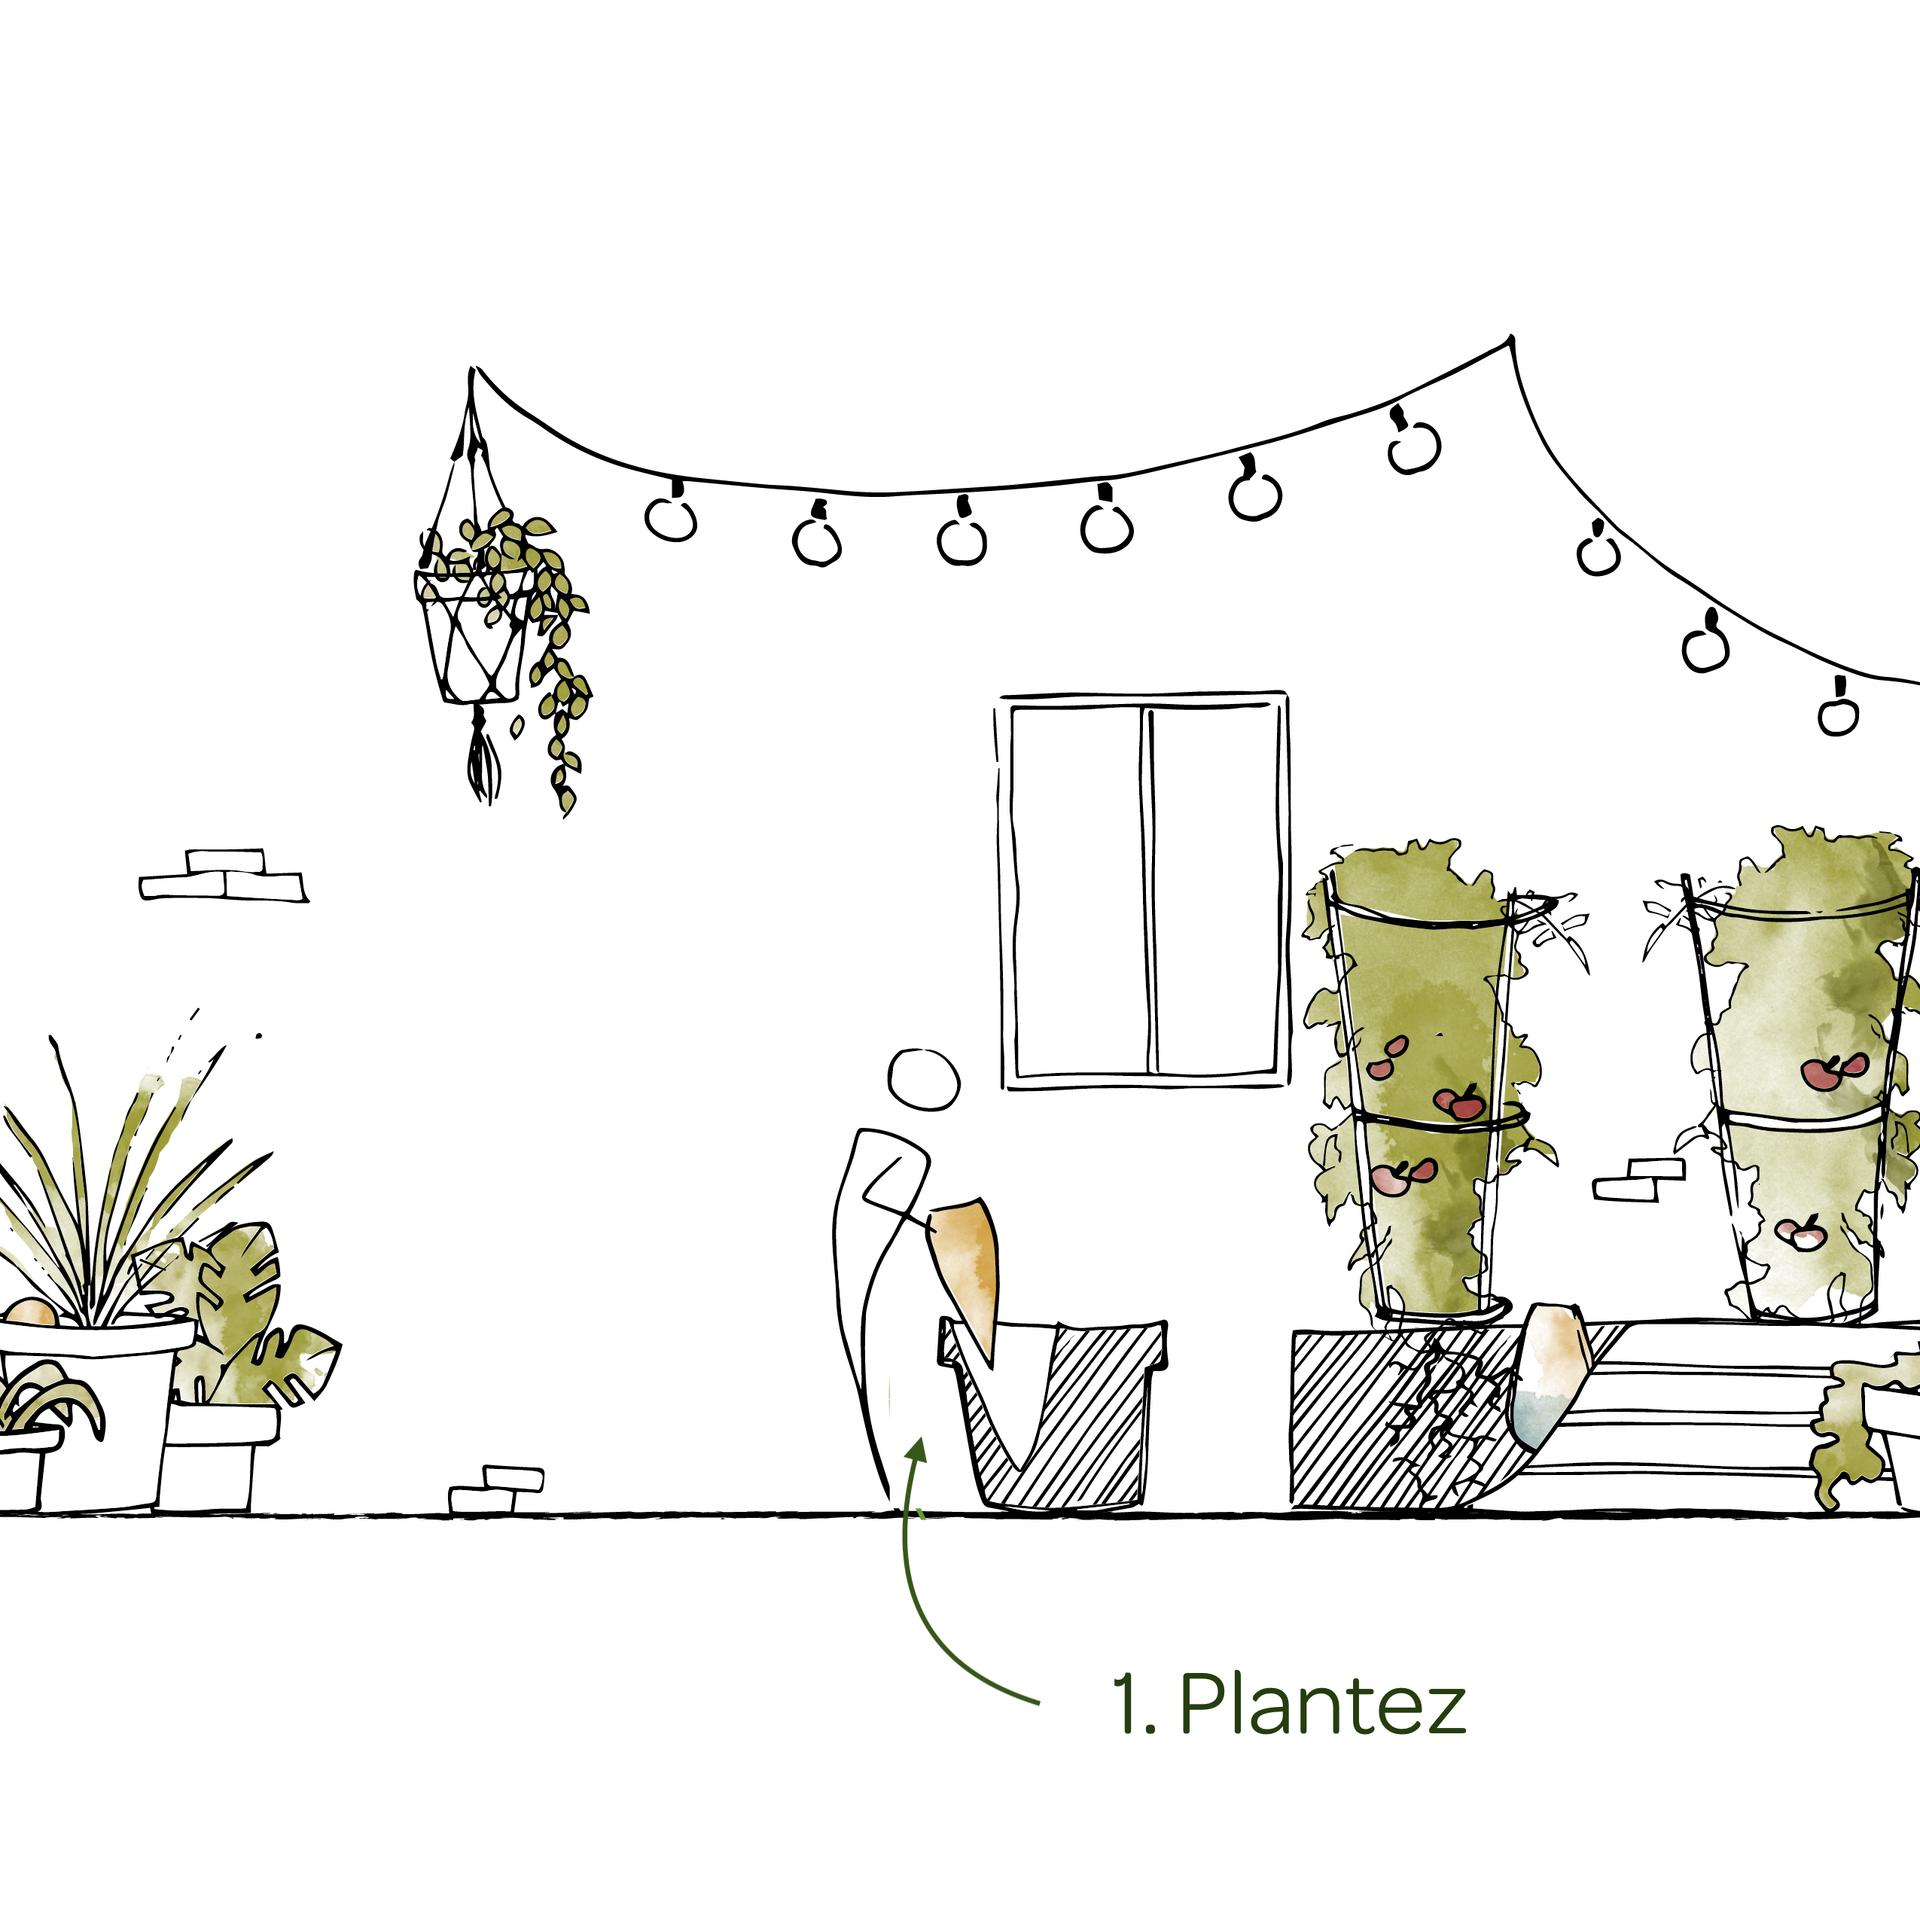 OIA_1.0 - Plantez.png